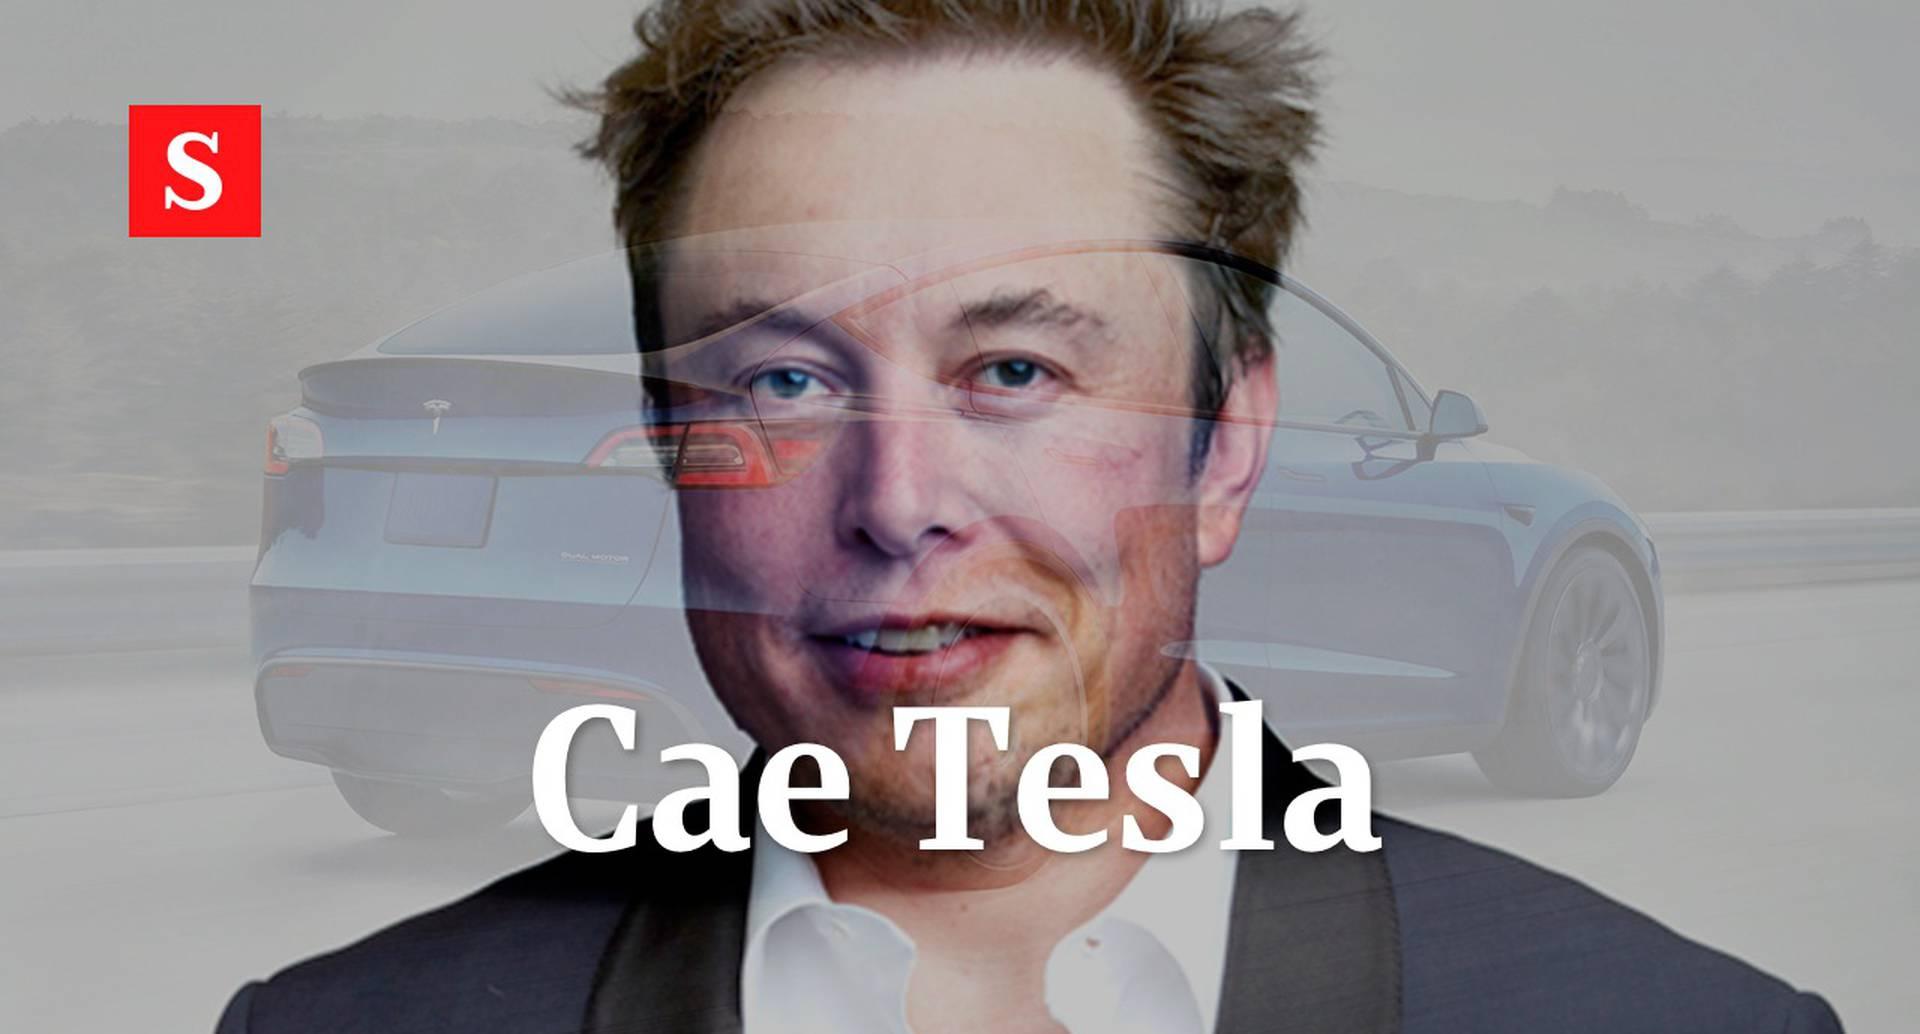 Cae Tesla